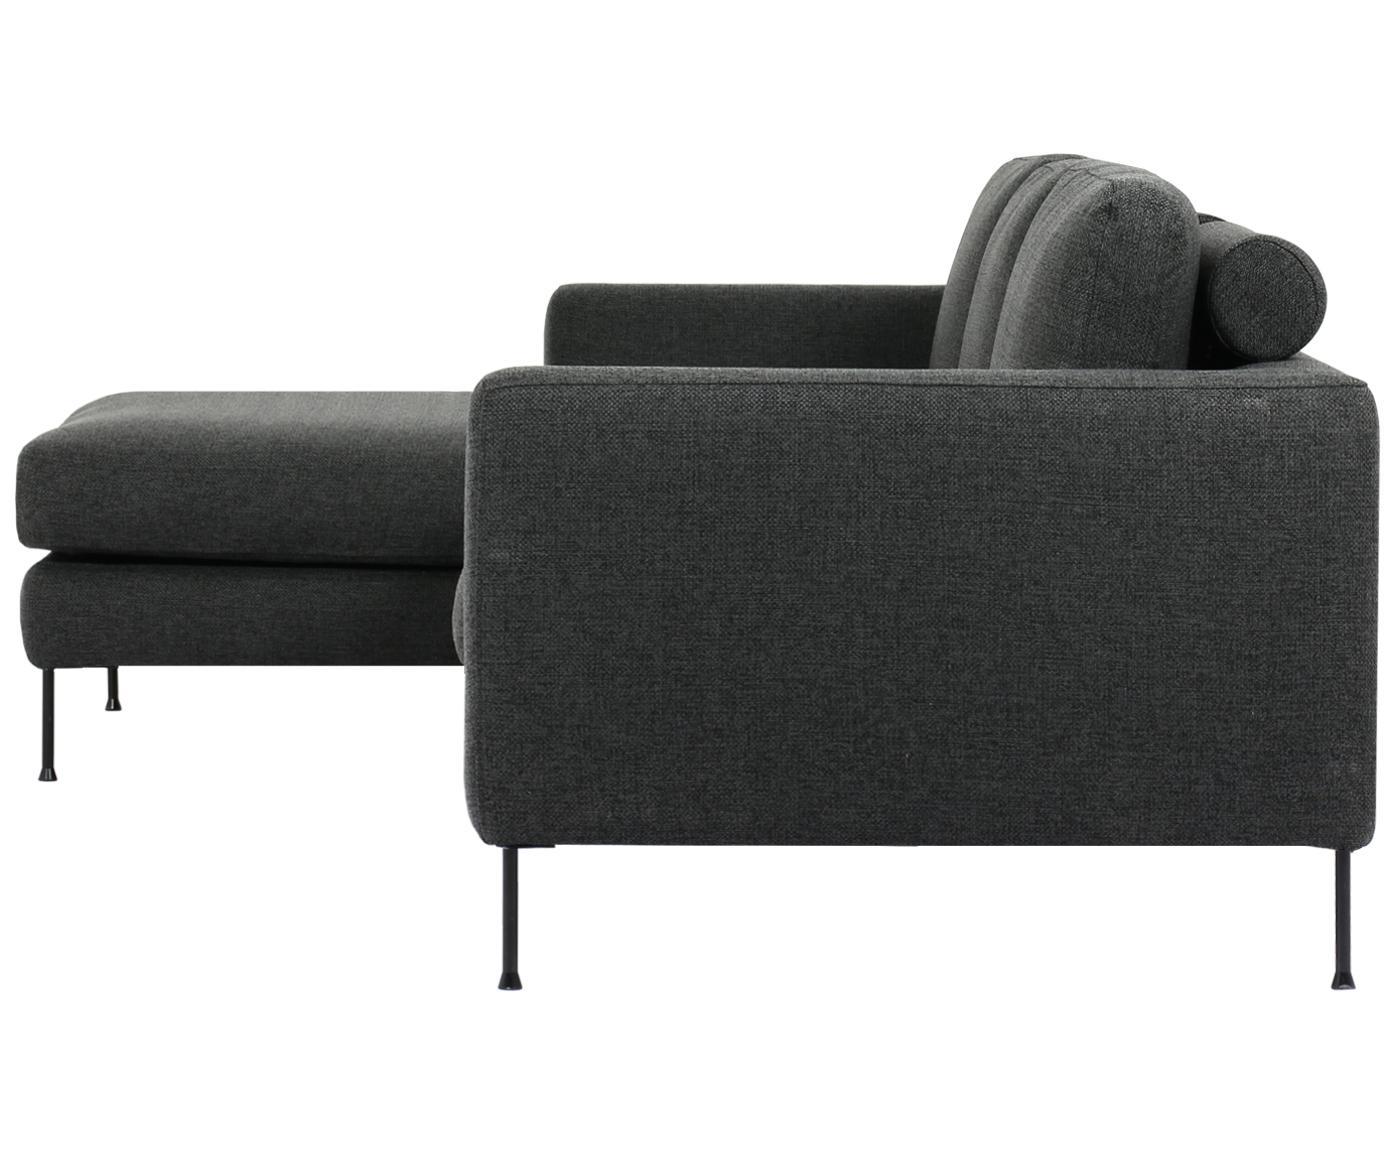 Hoekbank Cucita (3-zits), Bekleding: geweven stof (polyester), Frame: massief grenenhout, Poten: gelakt metaal, Antraciet, B 262 x D 163 cm